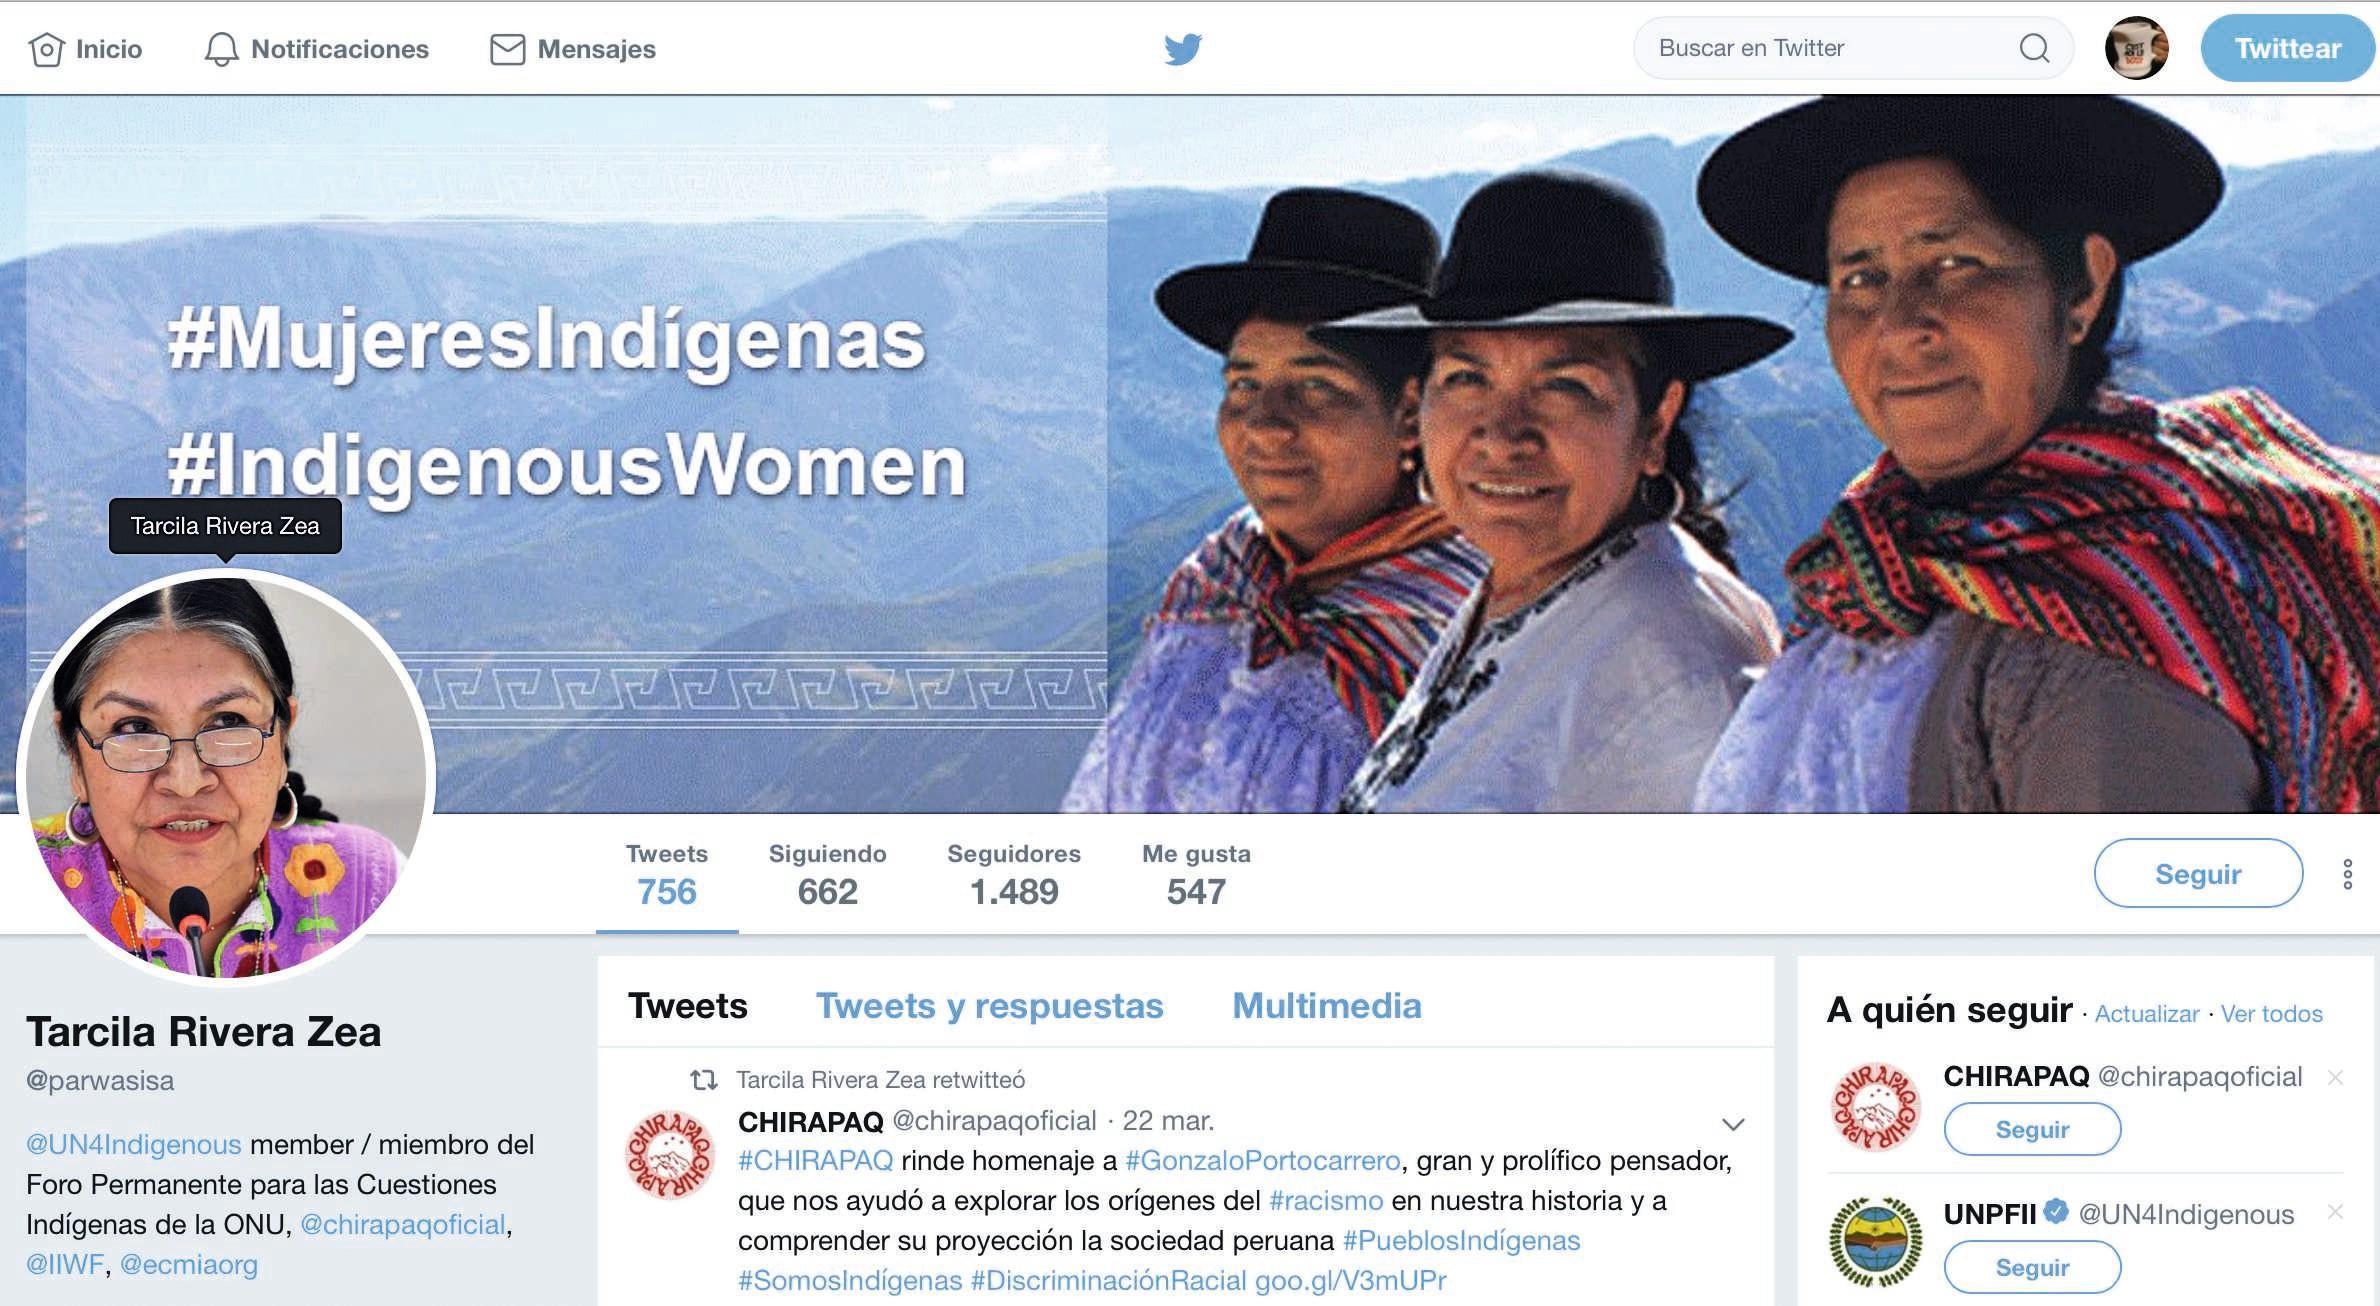 #Mujeresindígenas, página de Twitter de Tarcila Rivera Zea, 2019.